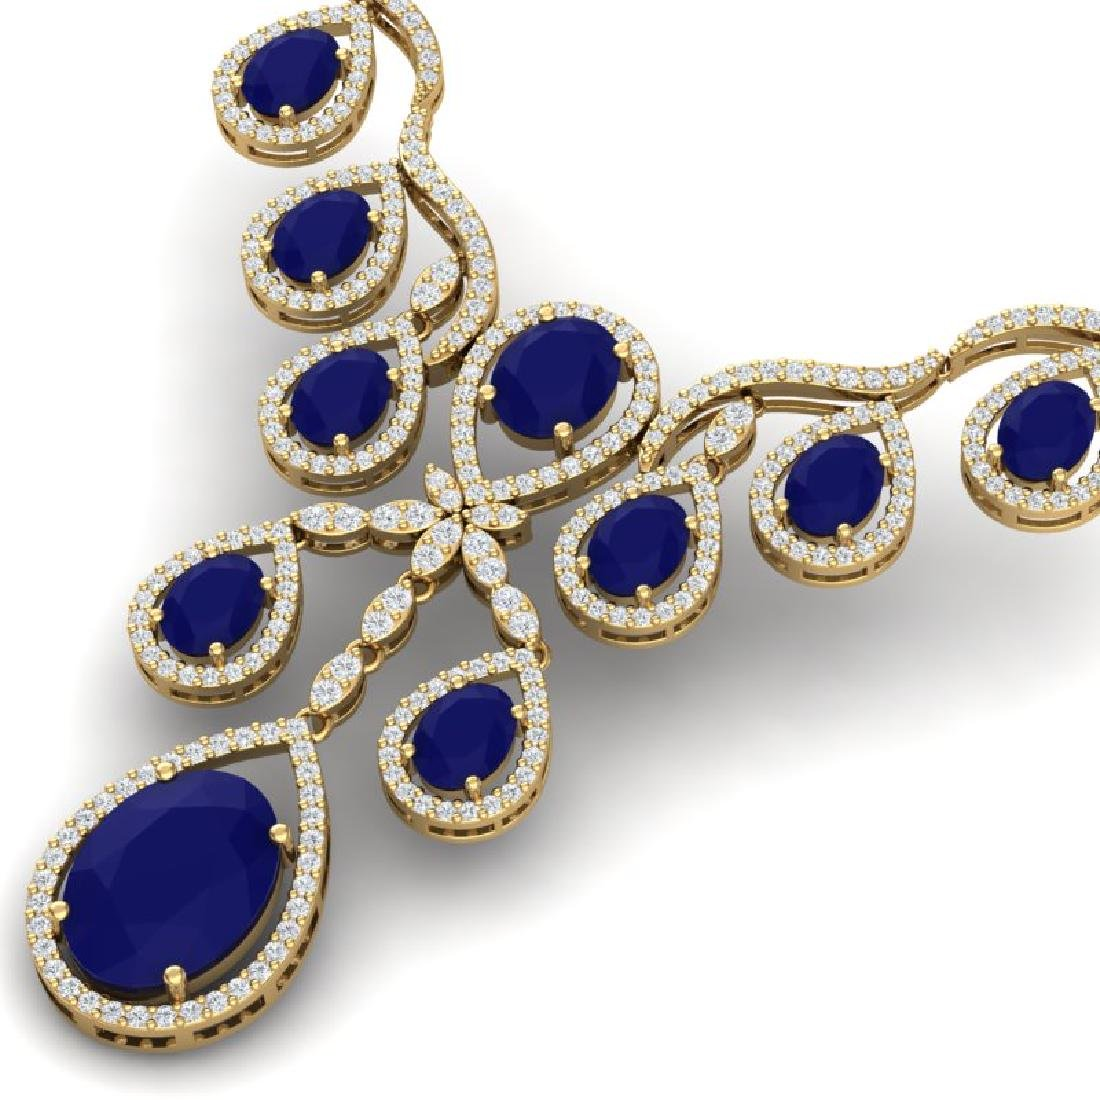 37.66 CTW Royalty Sapphire & VS Diamond Necklace 18K - 2